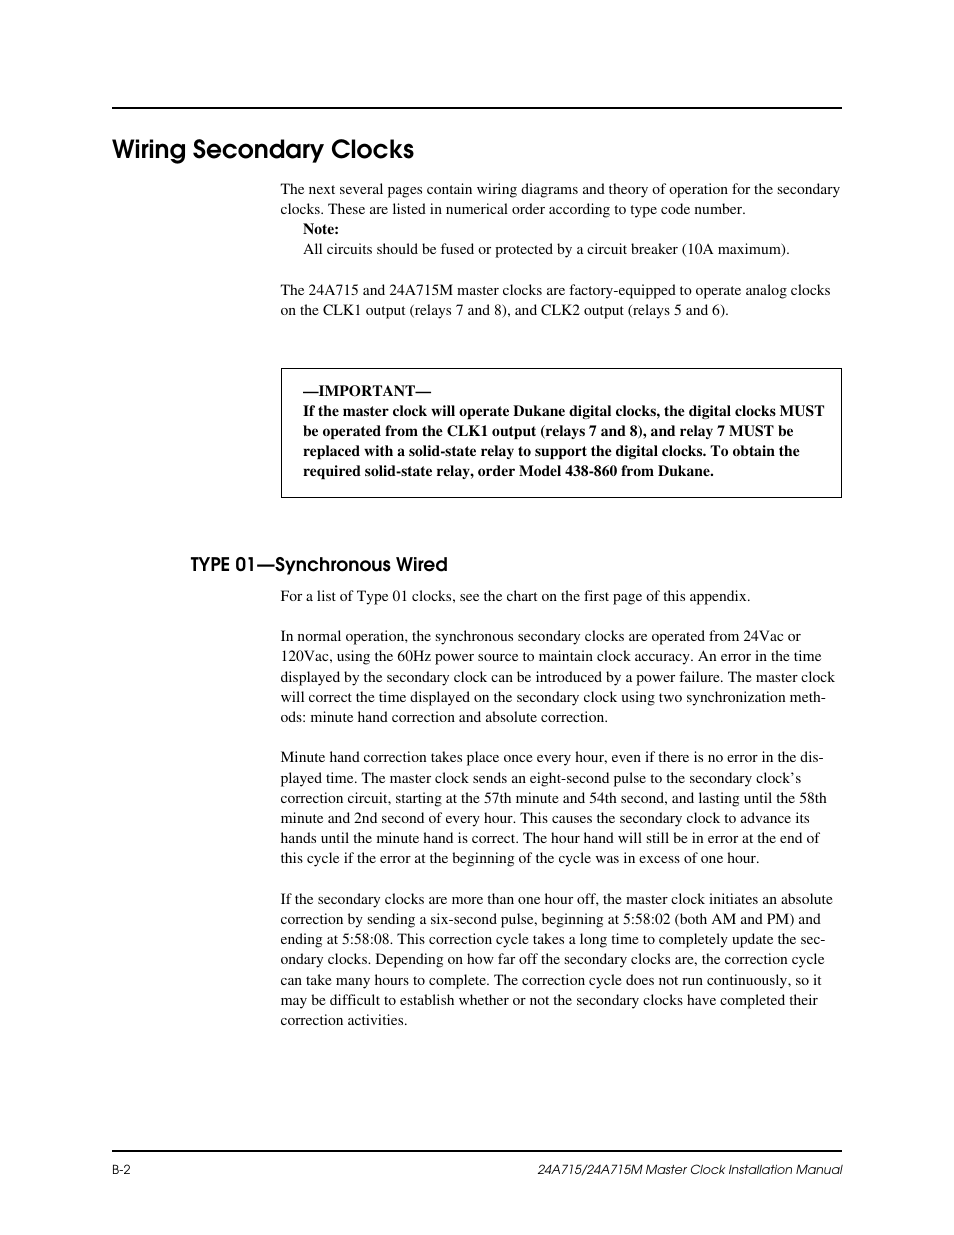 Wiring secondary clocks | Lathem Dukane 24A715 User Manual | Page 44 / 86